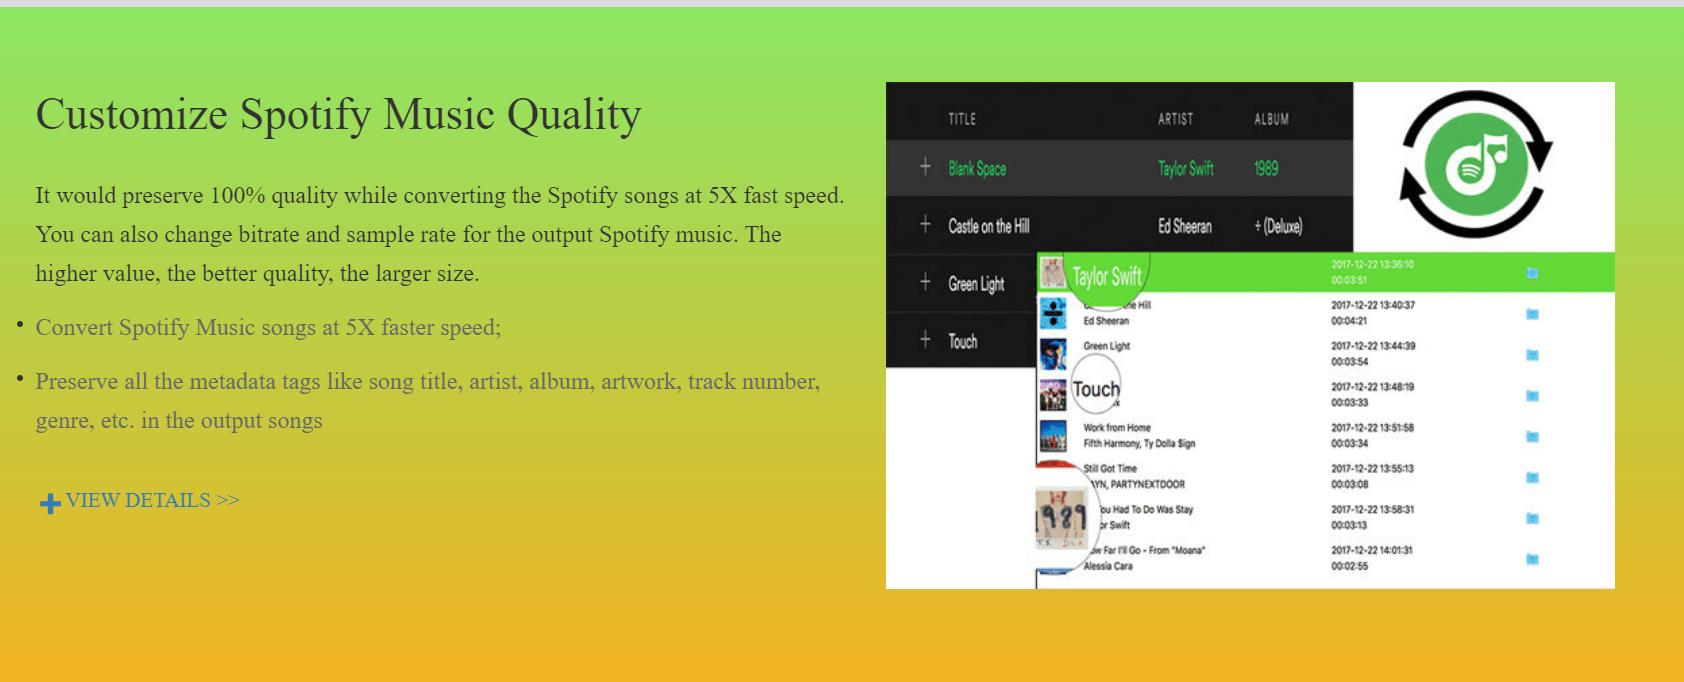 UkeySoft Spotify Music Converter Customize